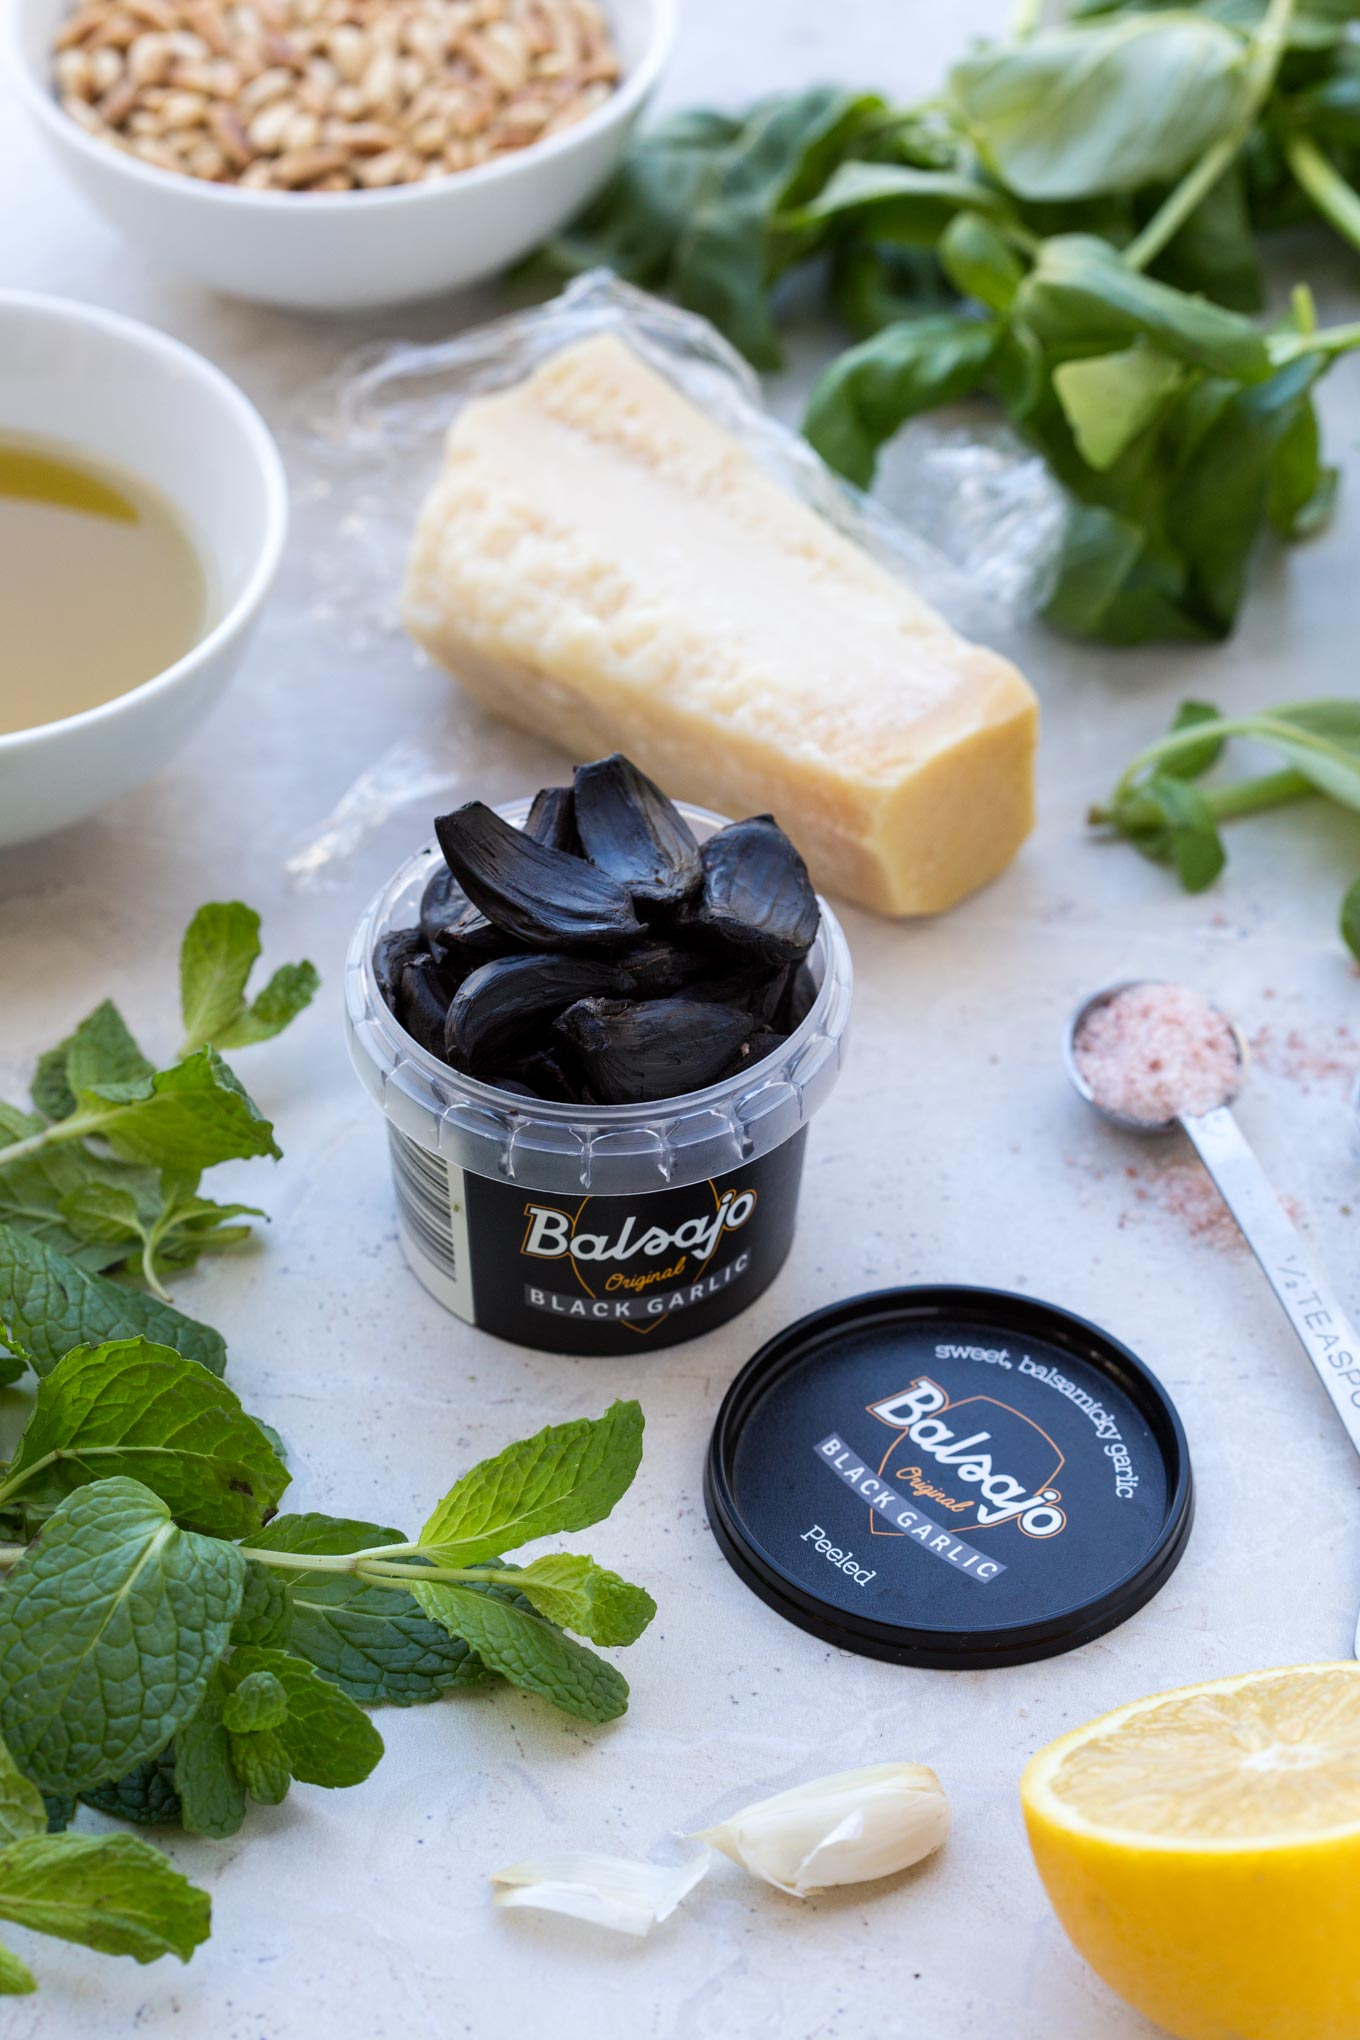 Mint, Basil, Pine Nuts, Olive Oil, Black Garlic in a Tub, Salt & Pepper, Pecorino Romano,